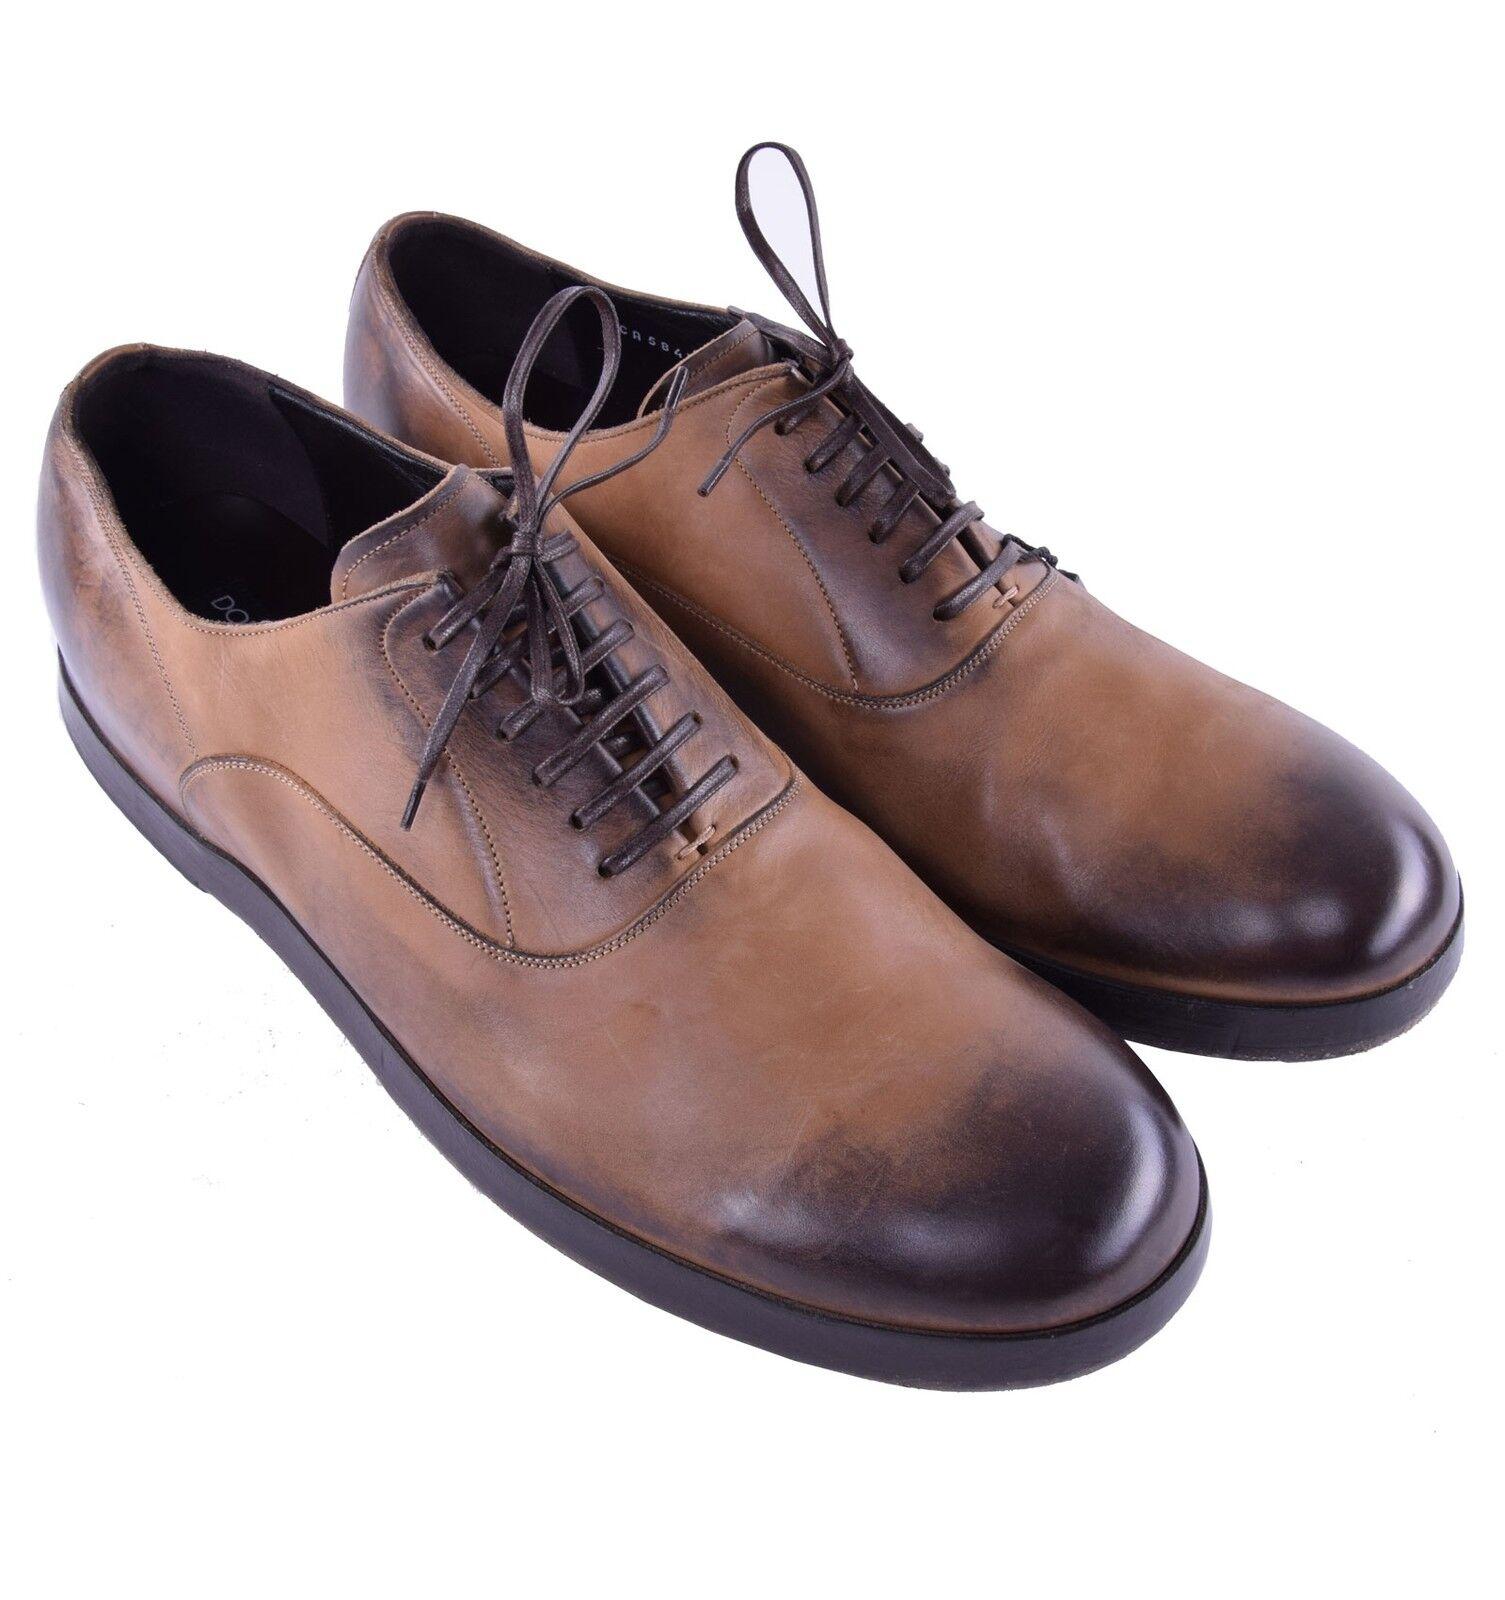 DOLCE Pelle & GABBANA RUNWAY Solid Calf Pelle DOLCE Shoes Light Brown 03895 b06196